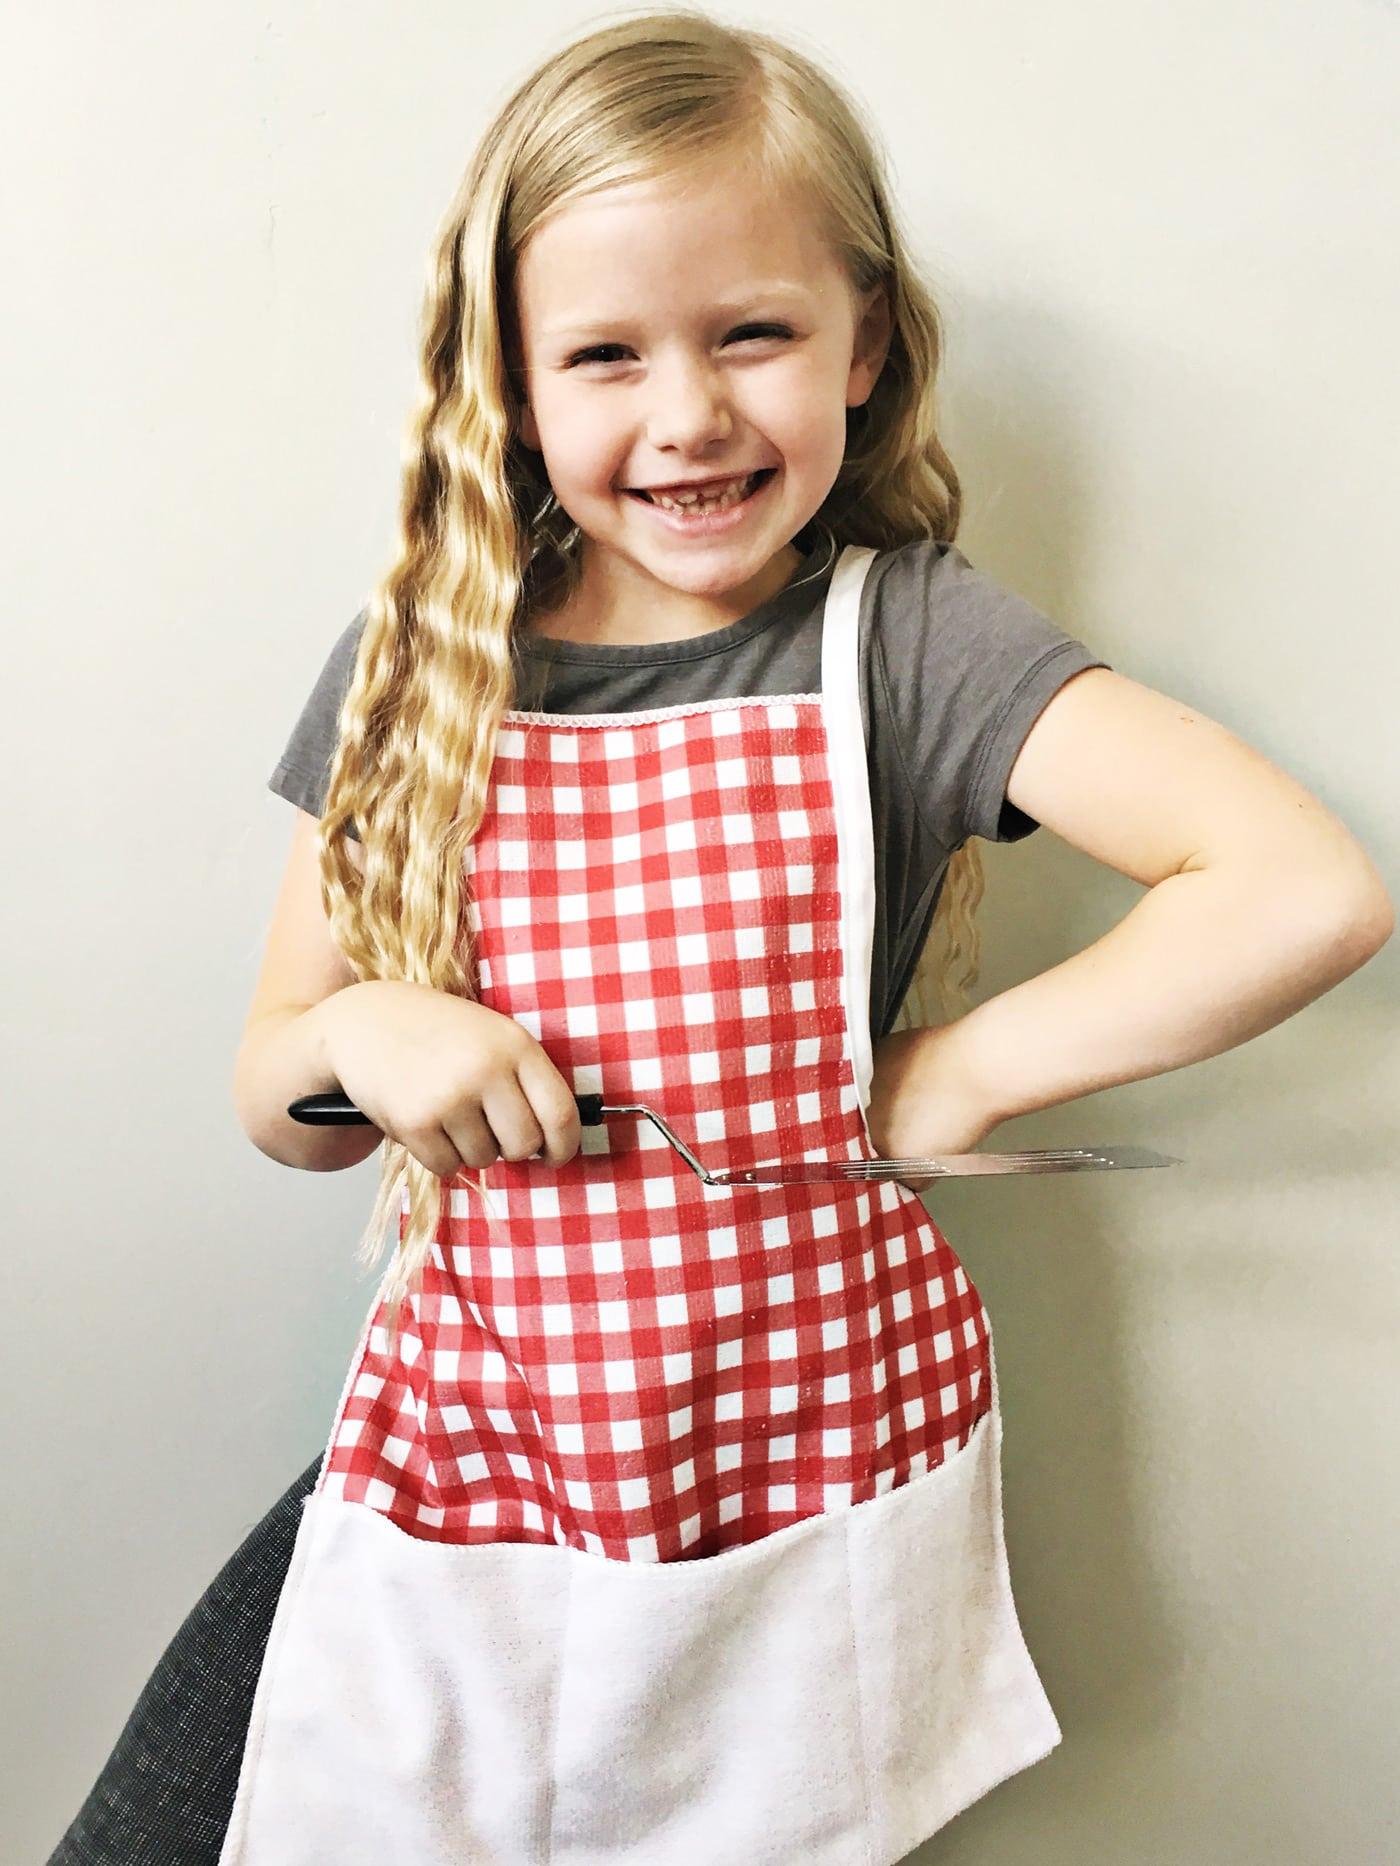 How To Make A Kids Bbq Apron The Polka Dot Chair